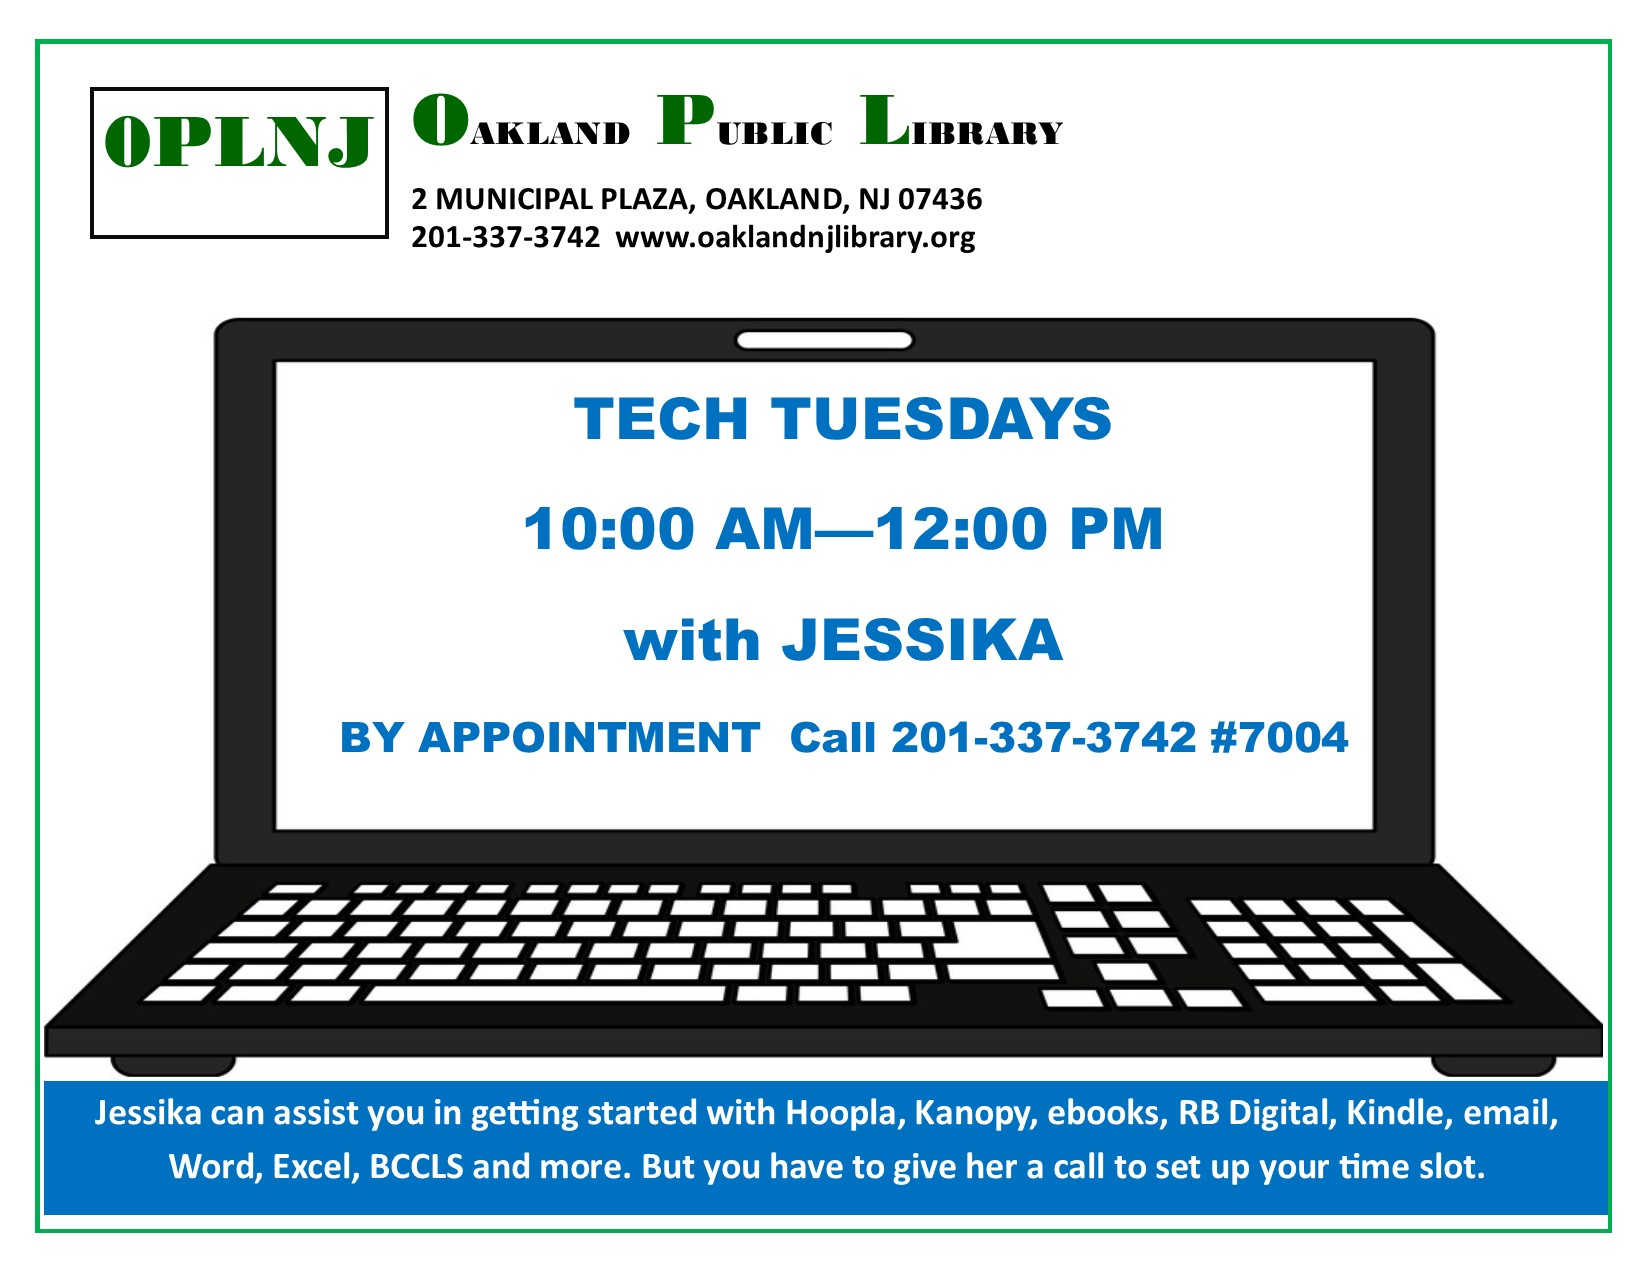 Tech Tuesdays 10 - 12 with Jessika